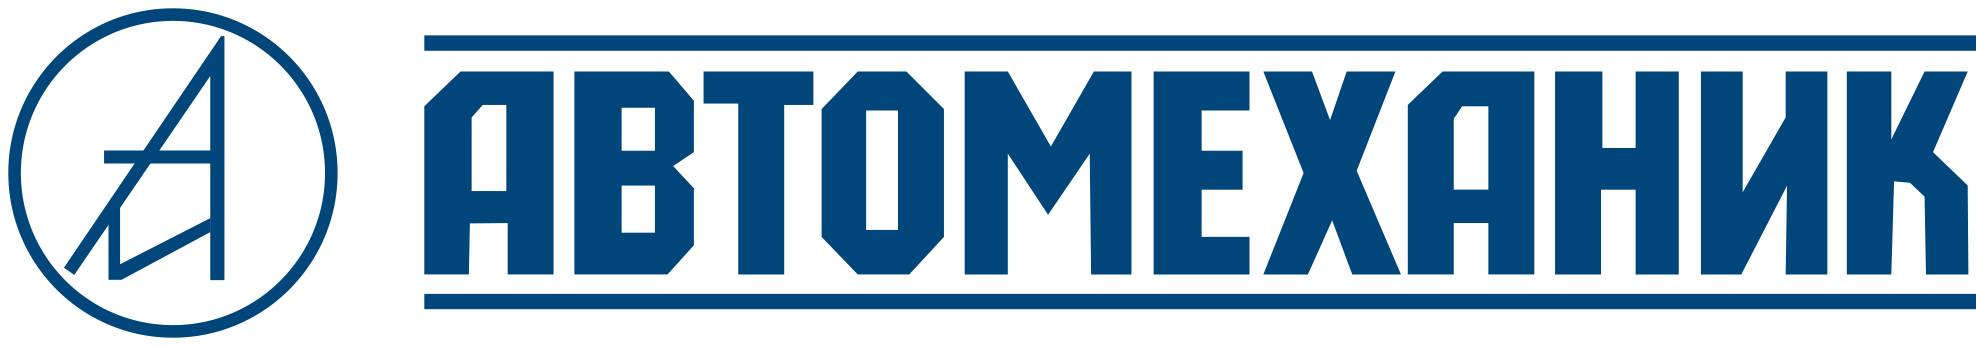 Логотип компании Автомеханик Орел